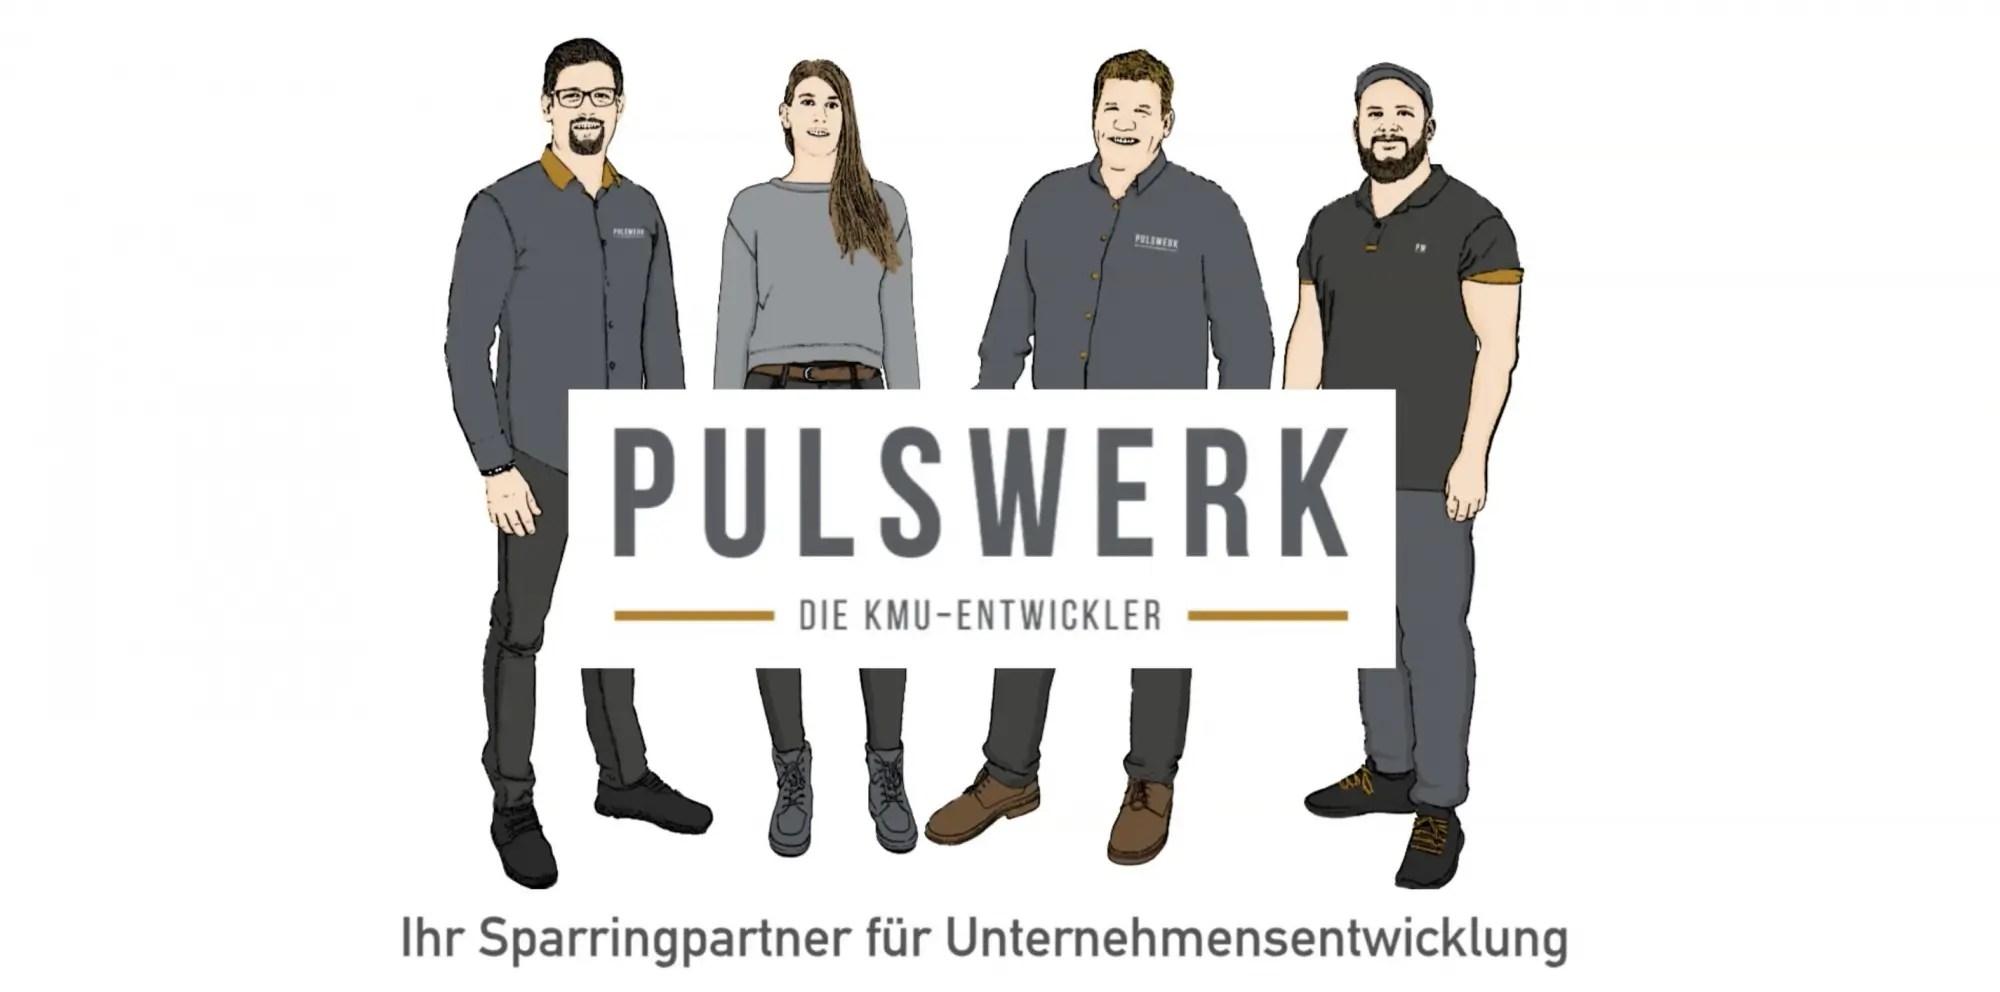 PULSWERK-Team